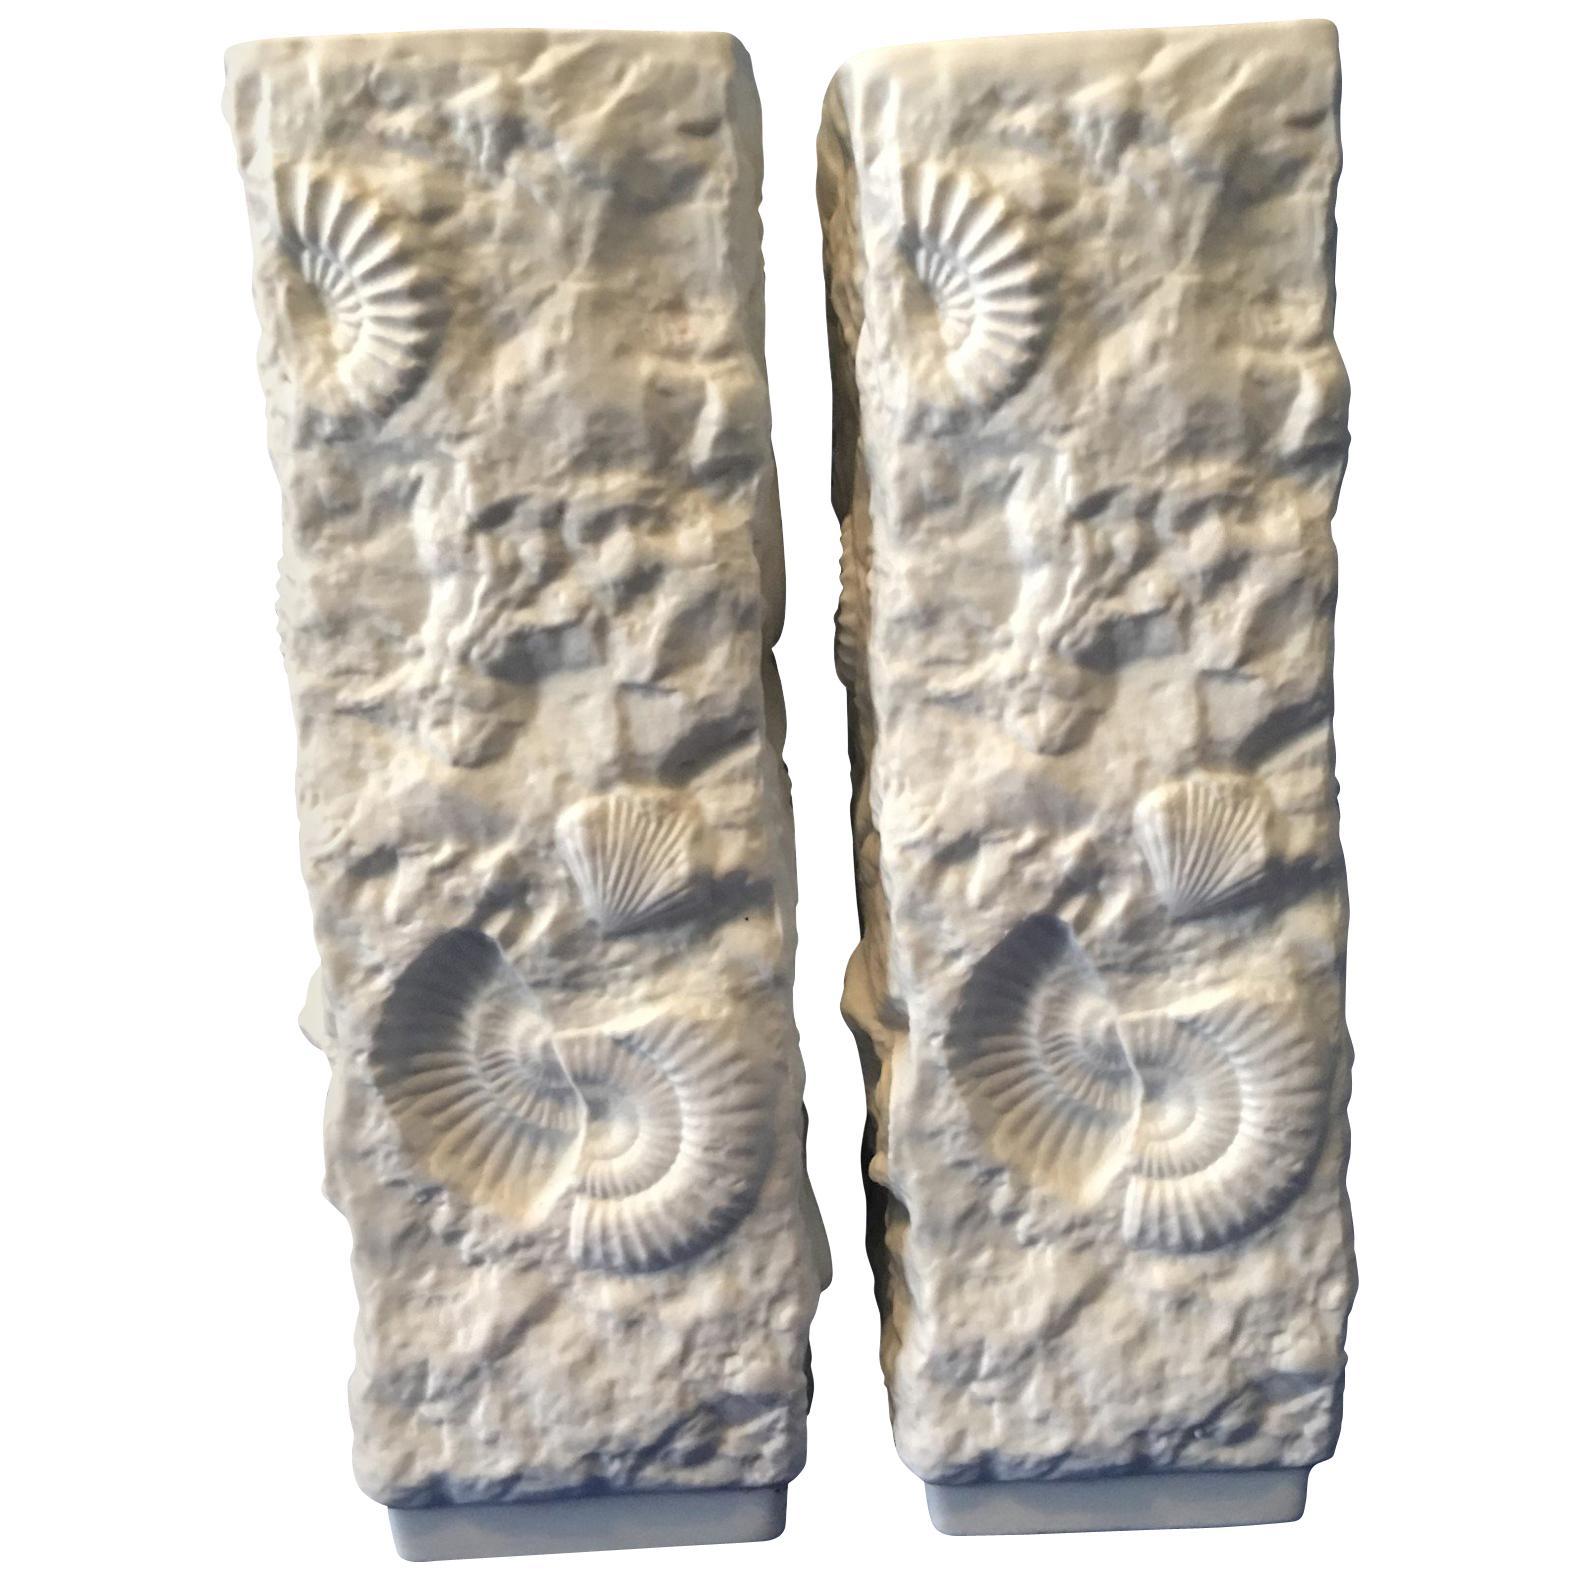 Pair of White Fossil Rock Matte  Porcelain Vases by Kaiser of Germany